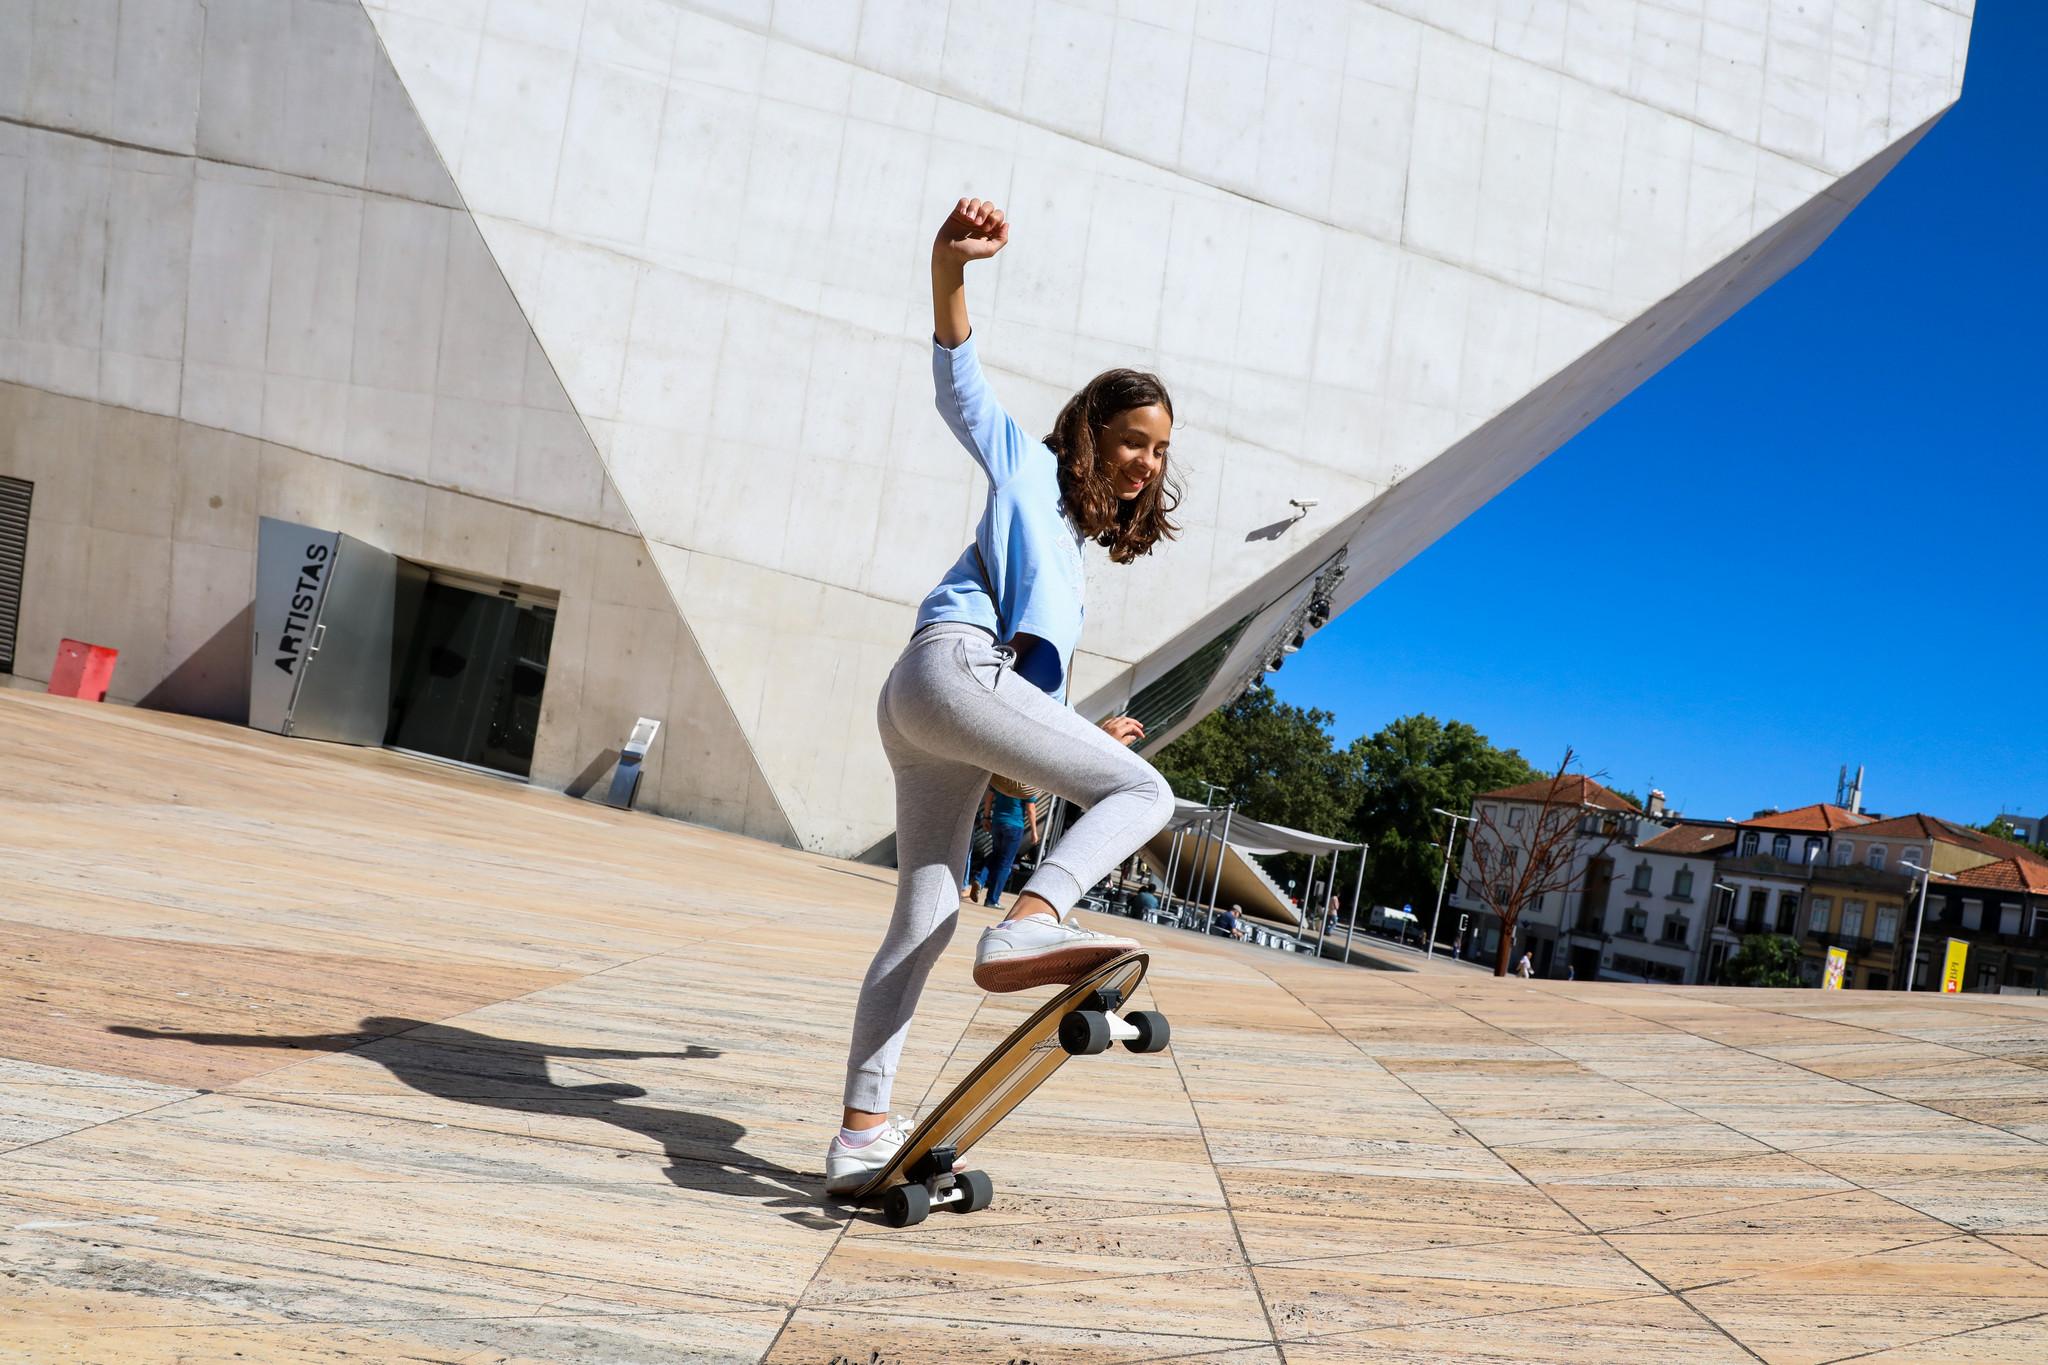 LM-Skate  Casa Musica 13-08-18-4.jpg